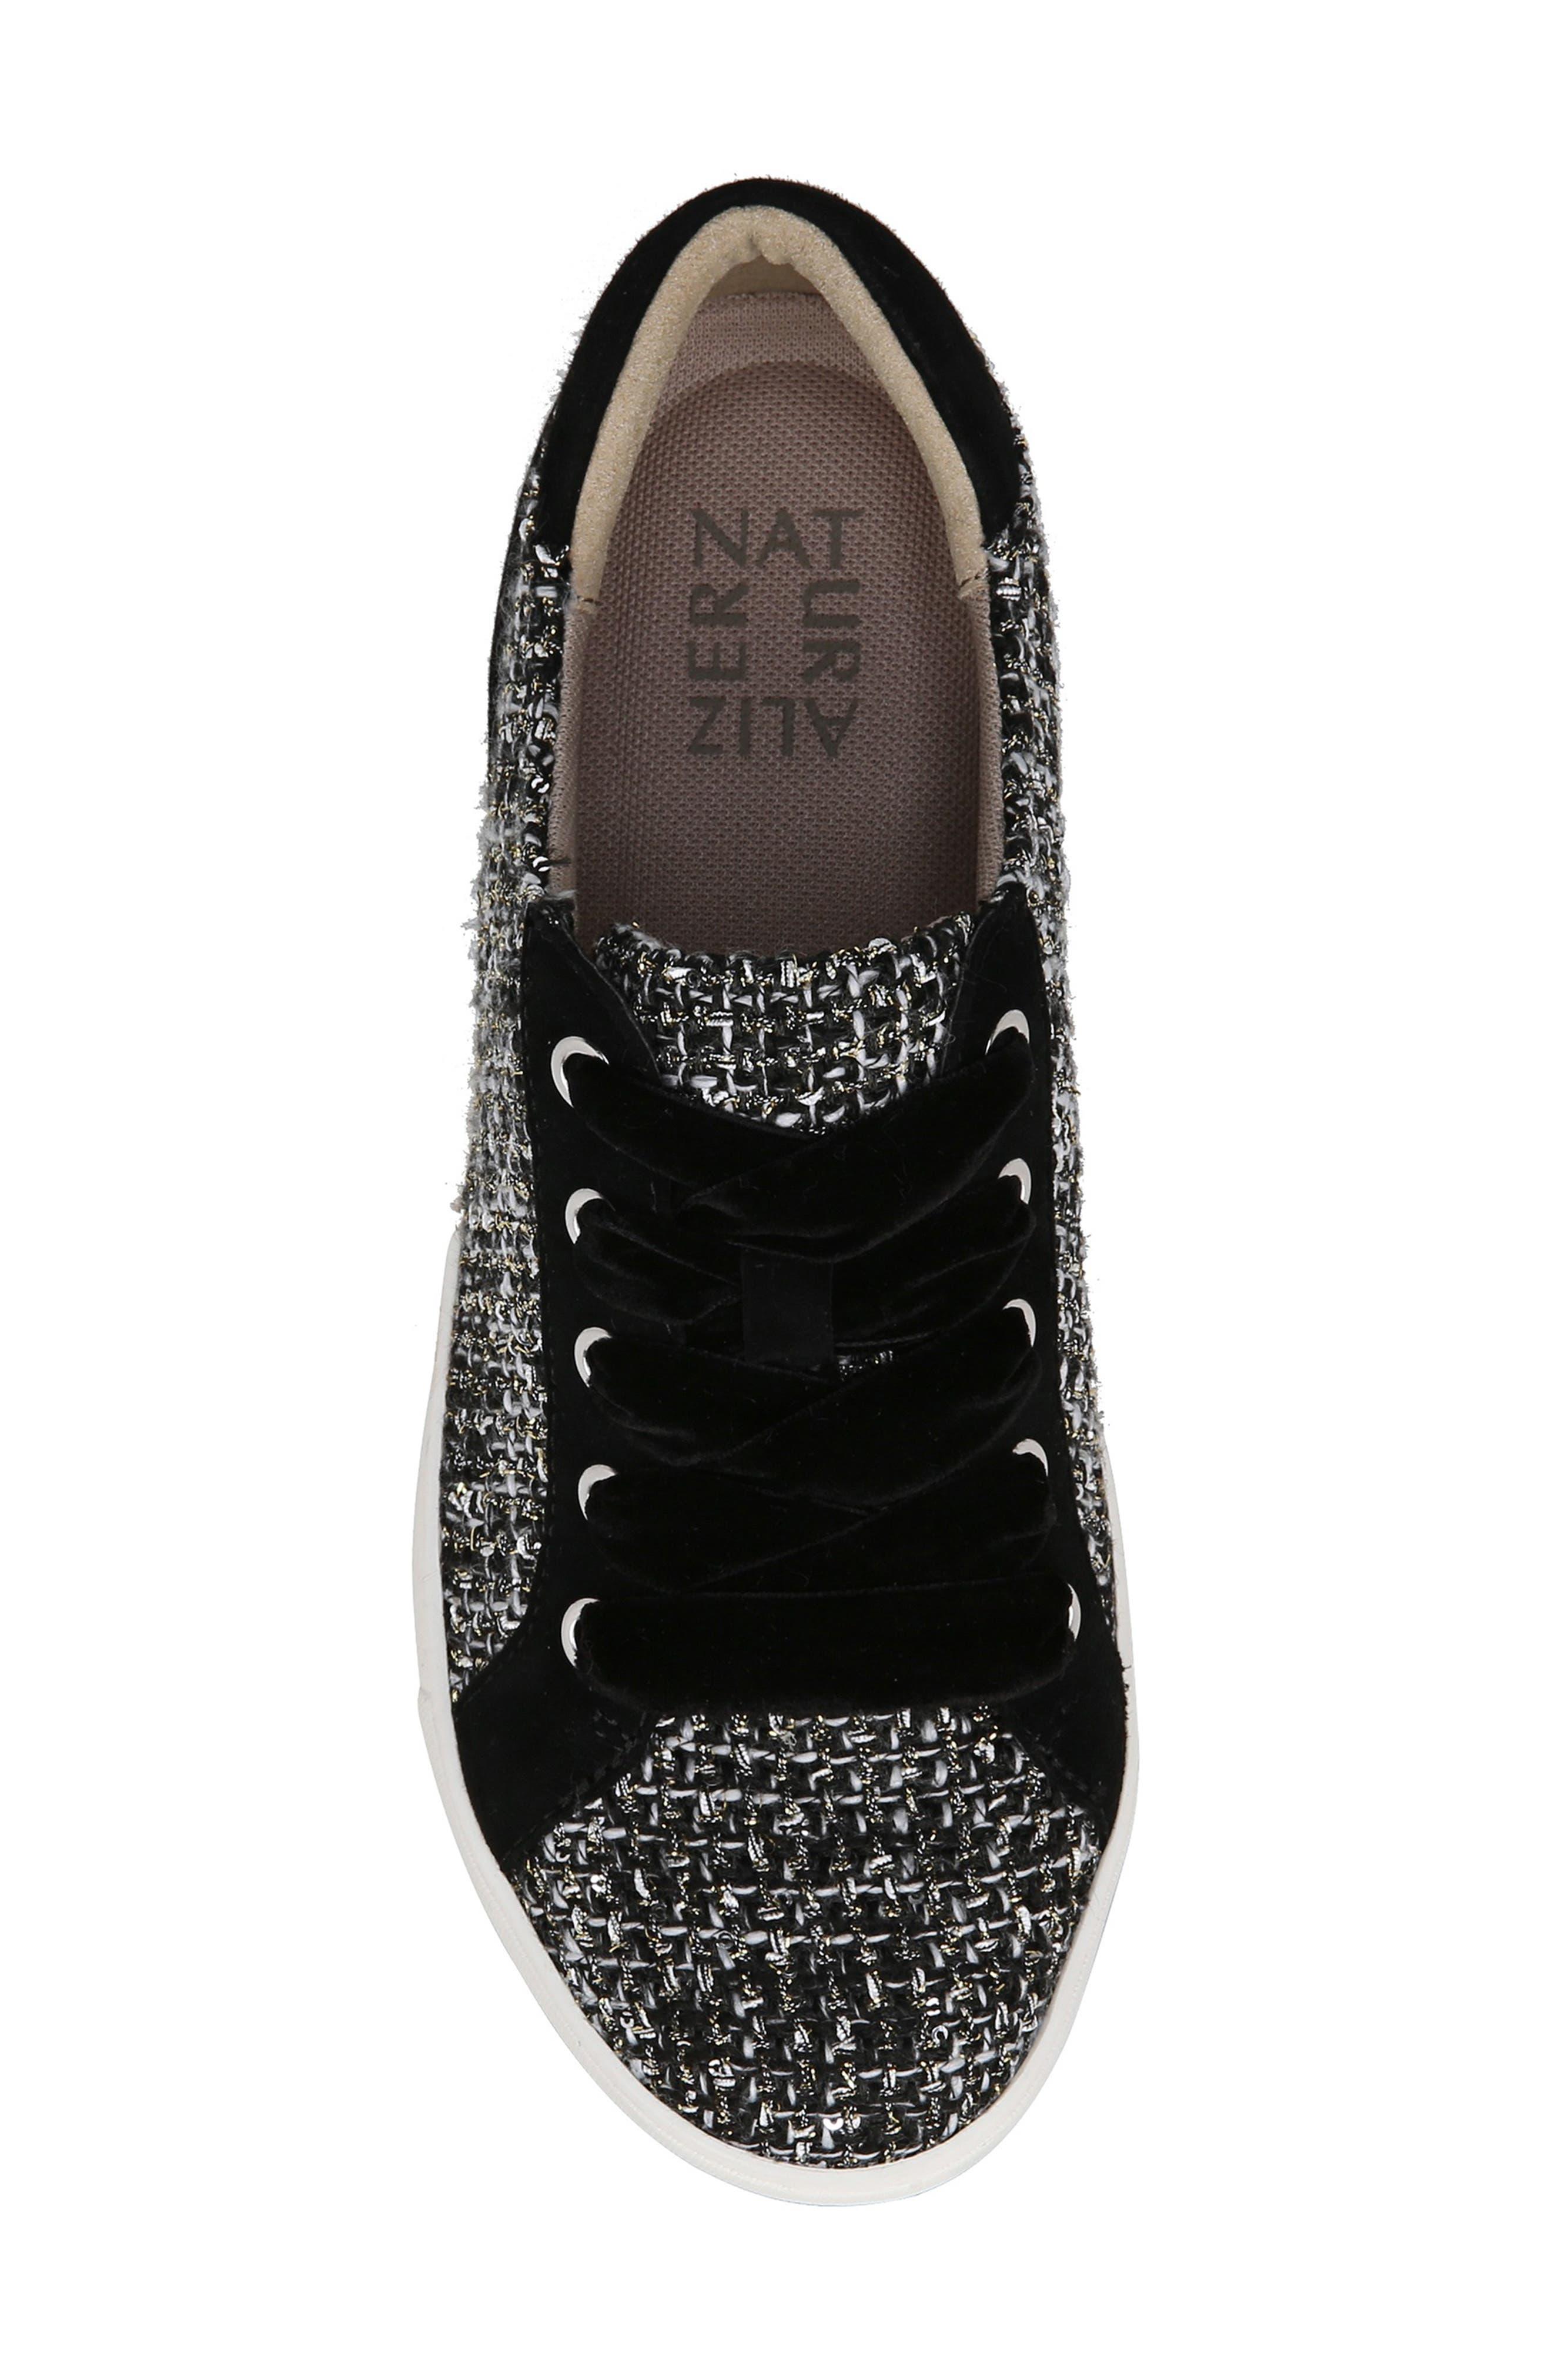 Morrison Sneaker,                             Alternate thumbnail 5, color,                             BLACK/ WHITE TWEED FABRIC